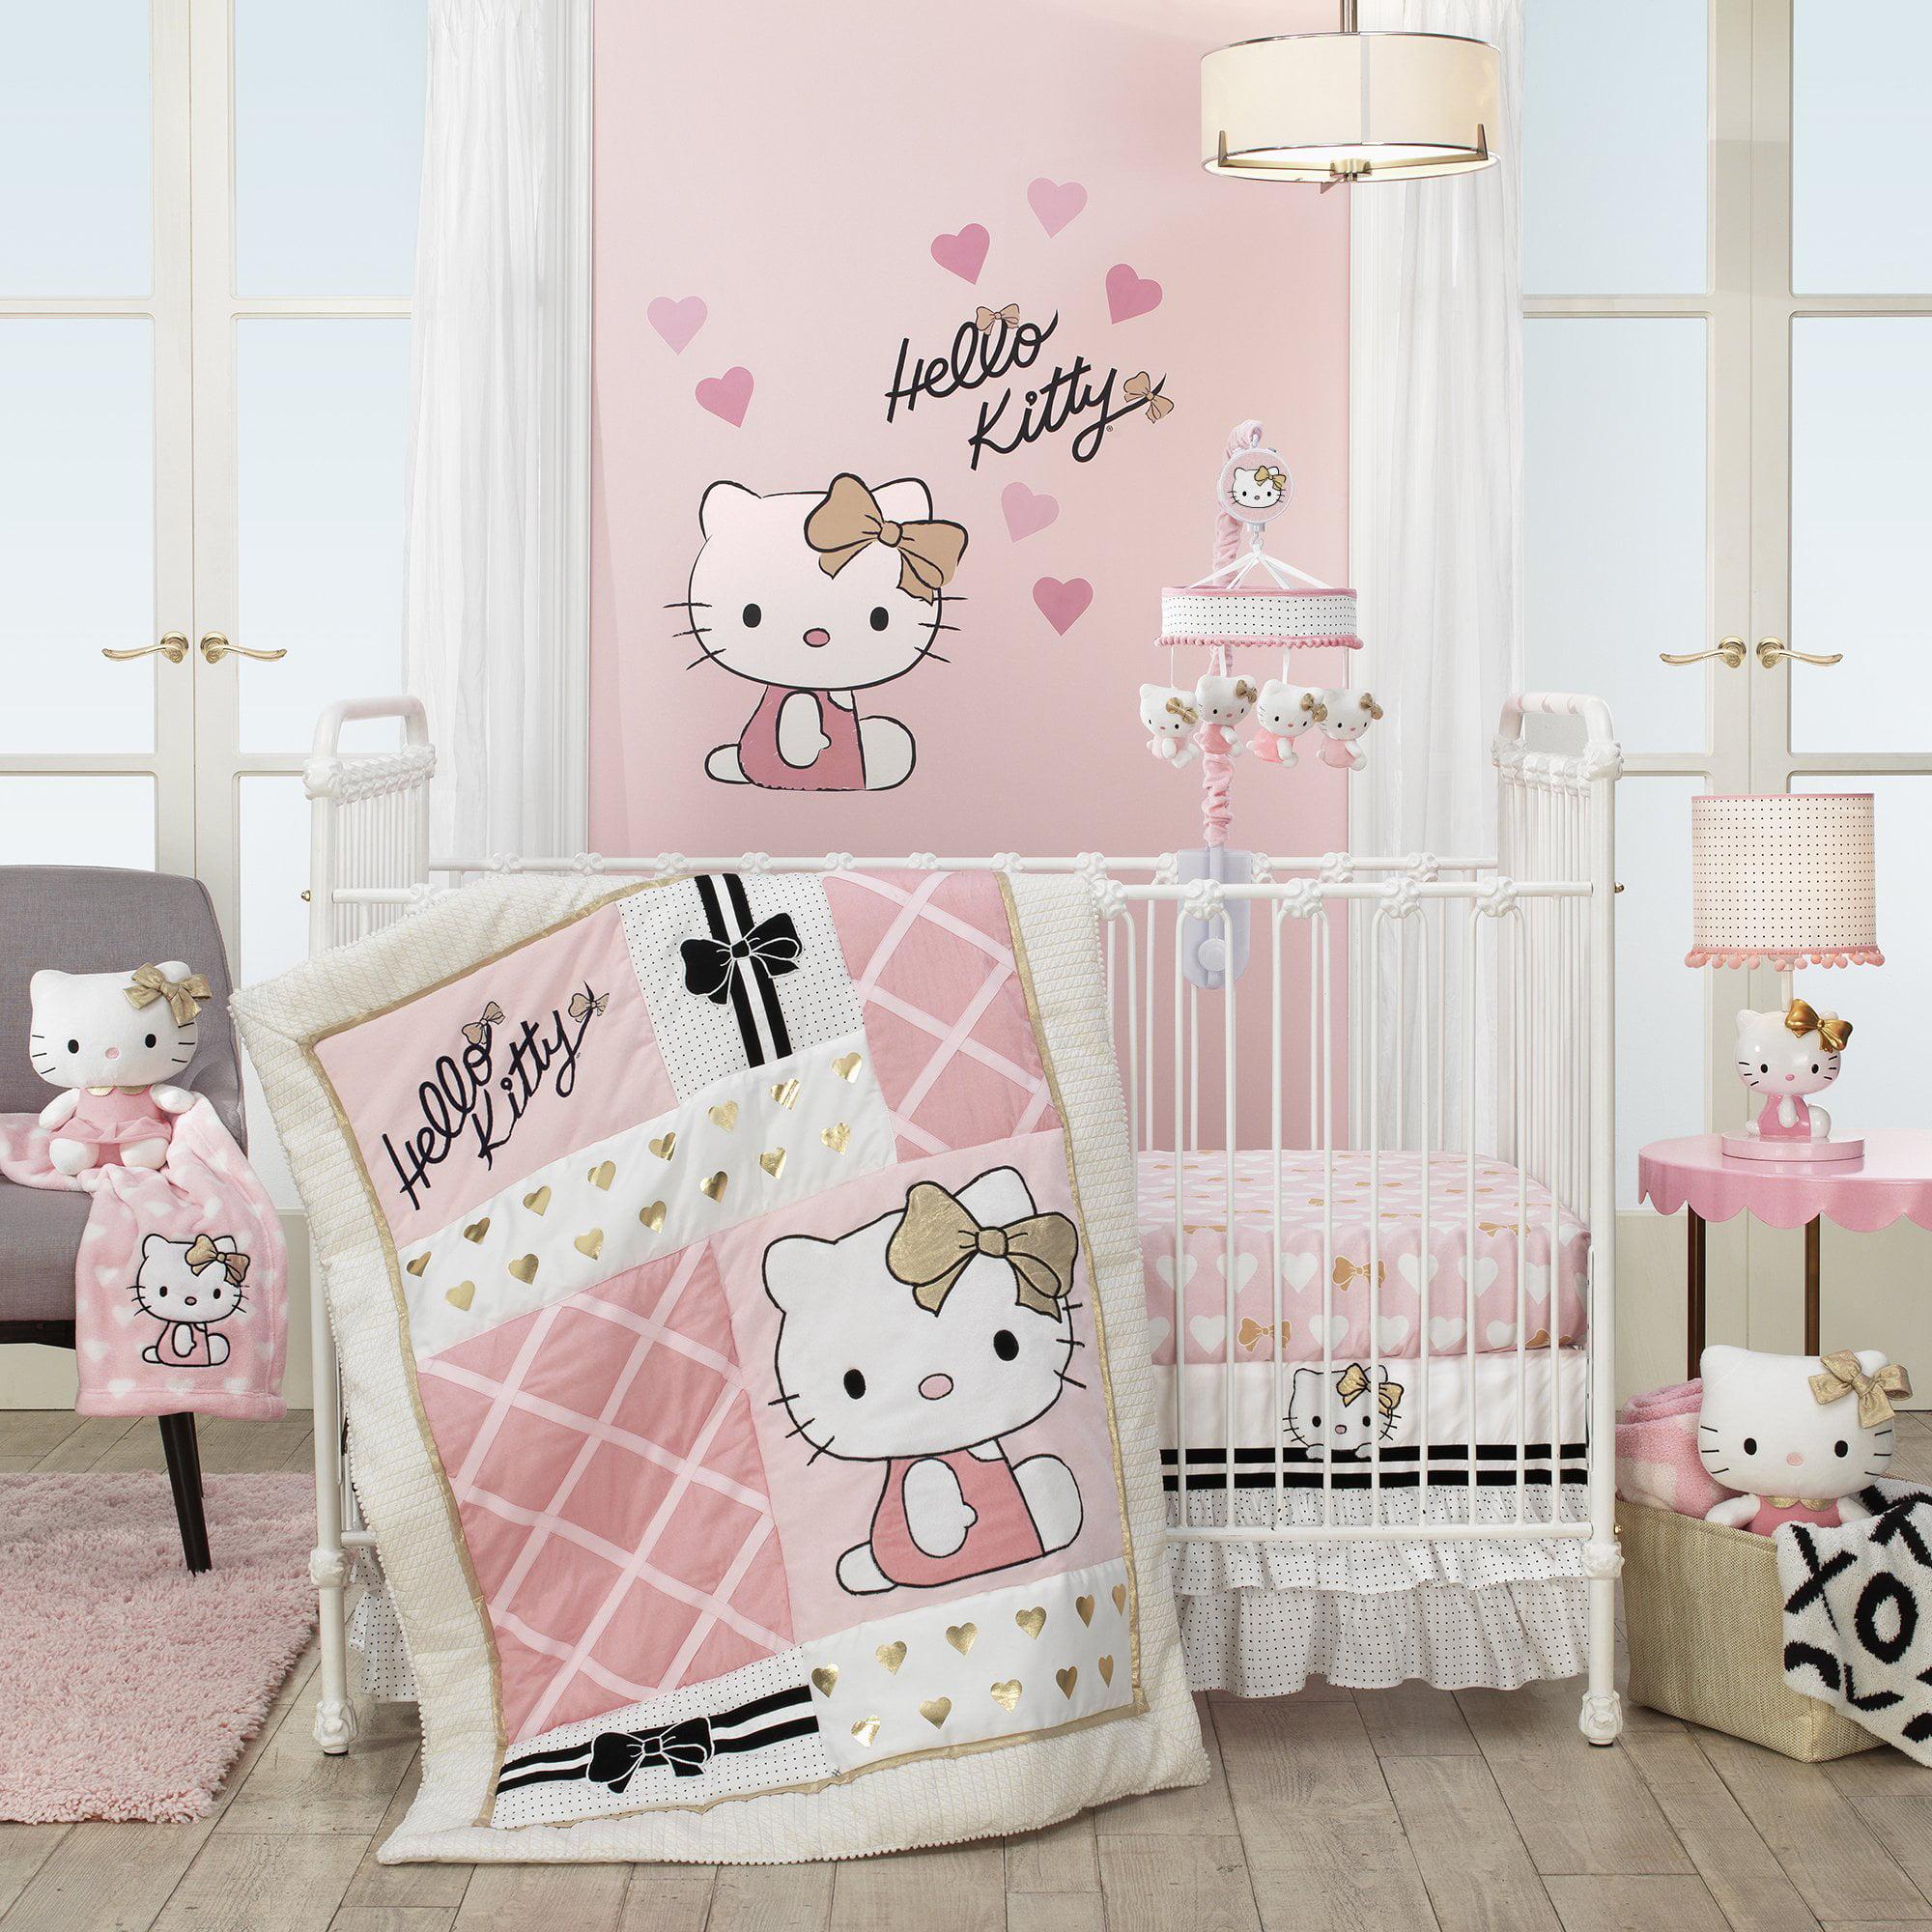 Lambs Ivy Hello Kitty 3 Piece Crib Bedding Set Pink Gold White